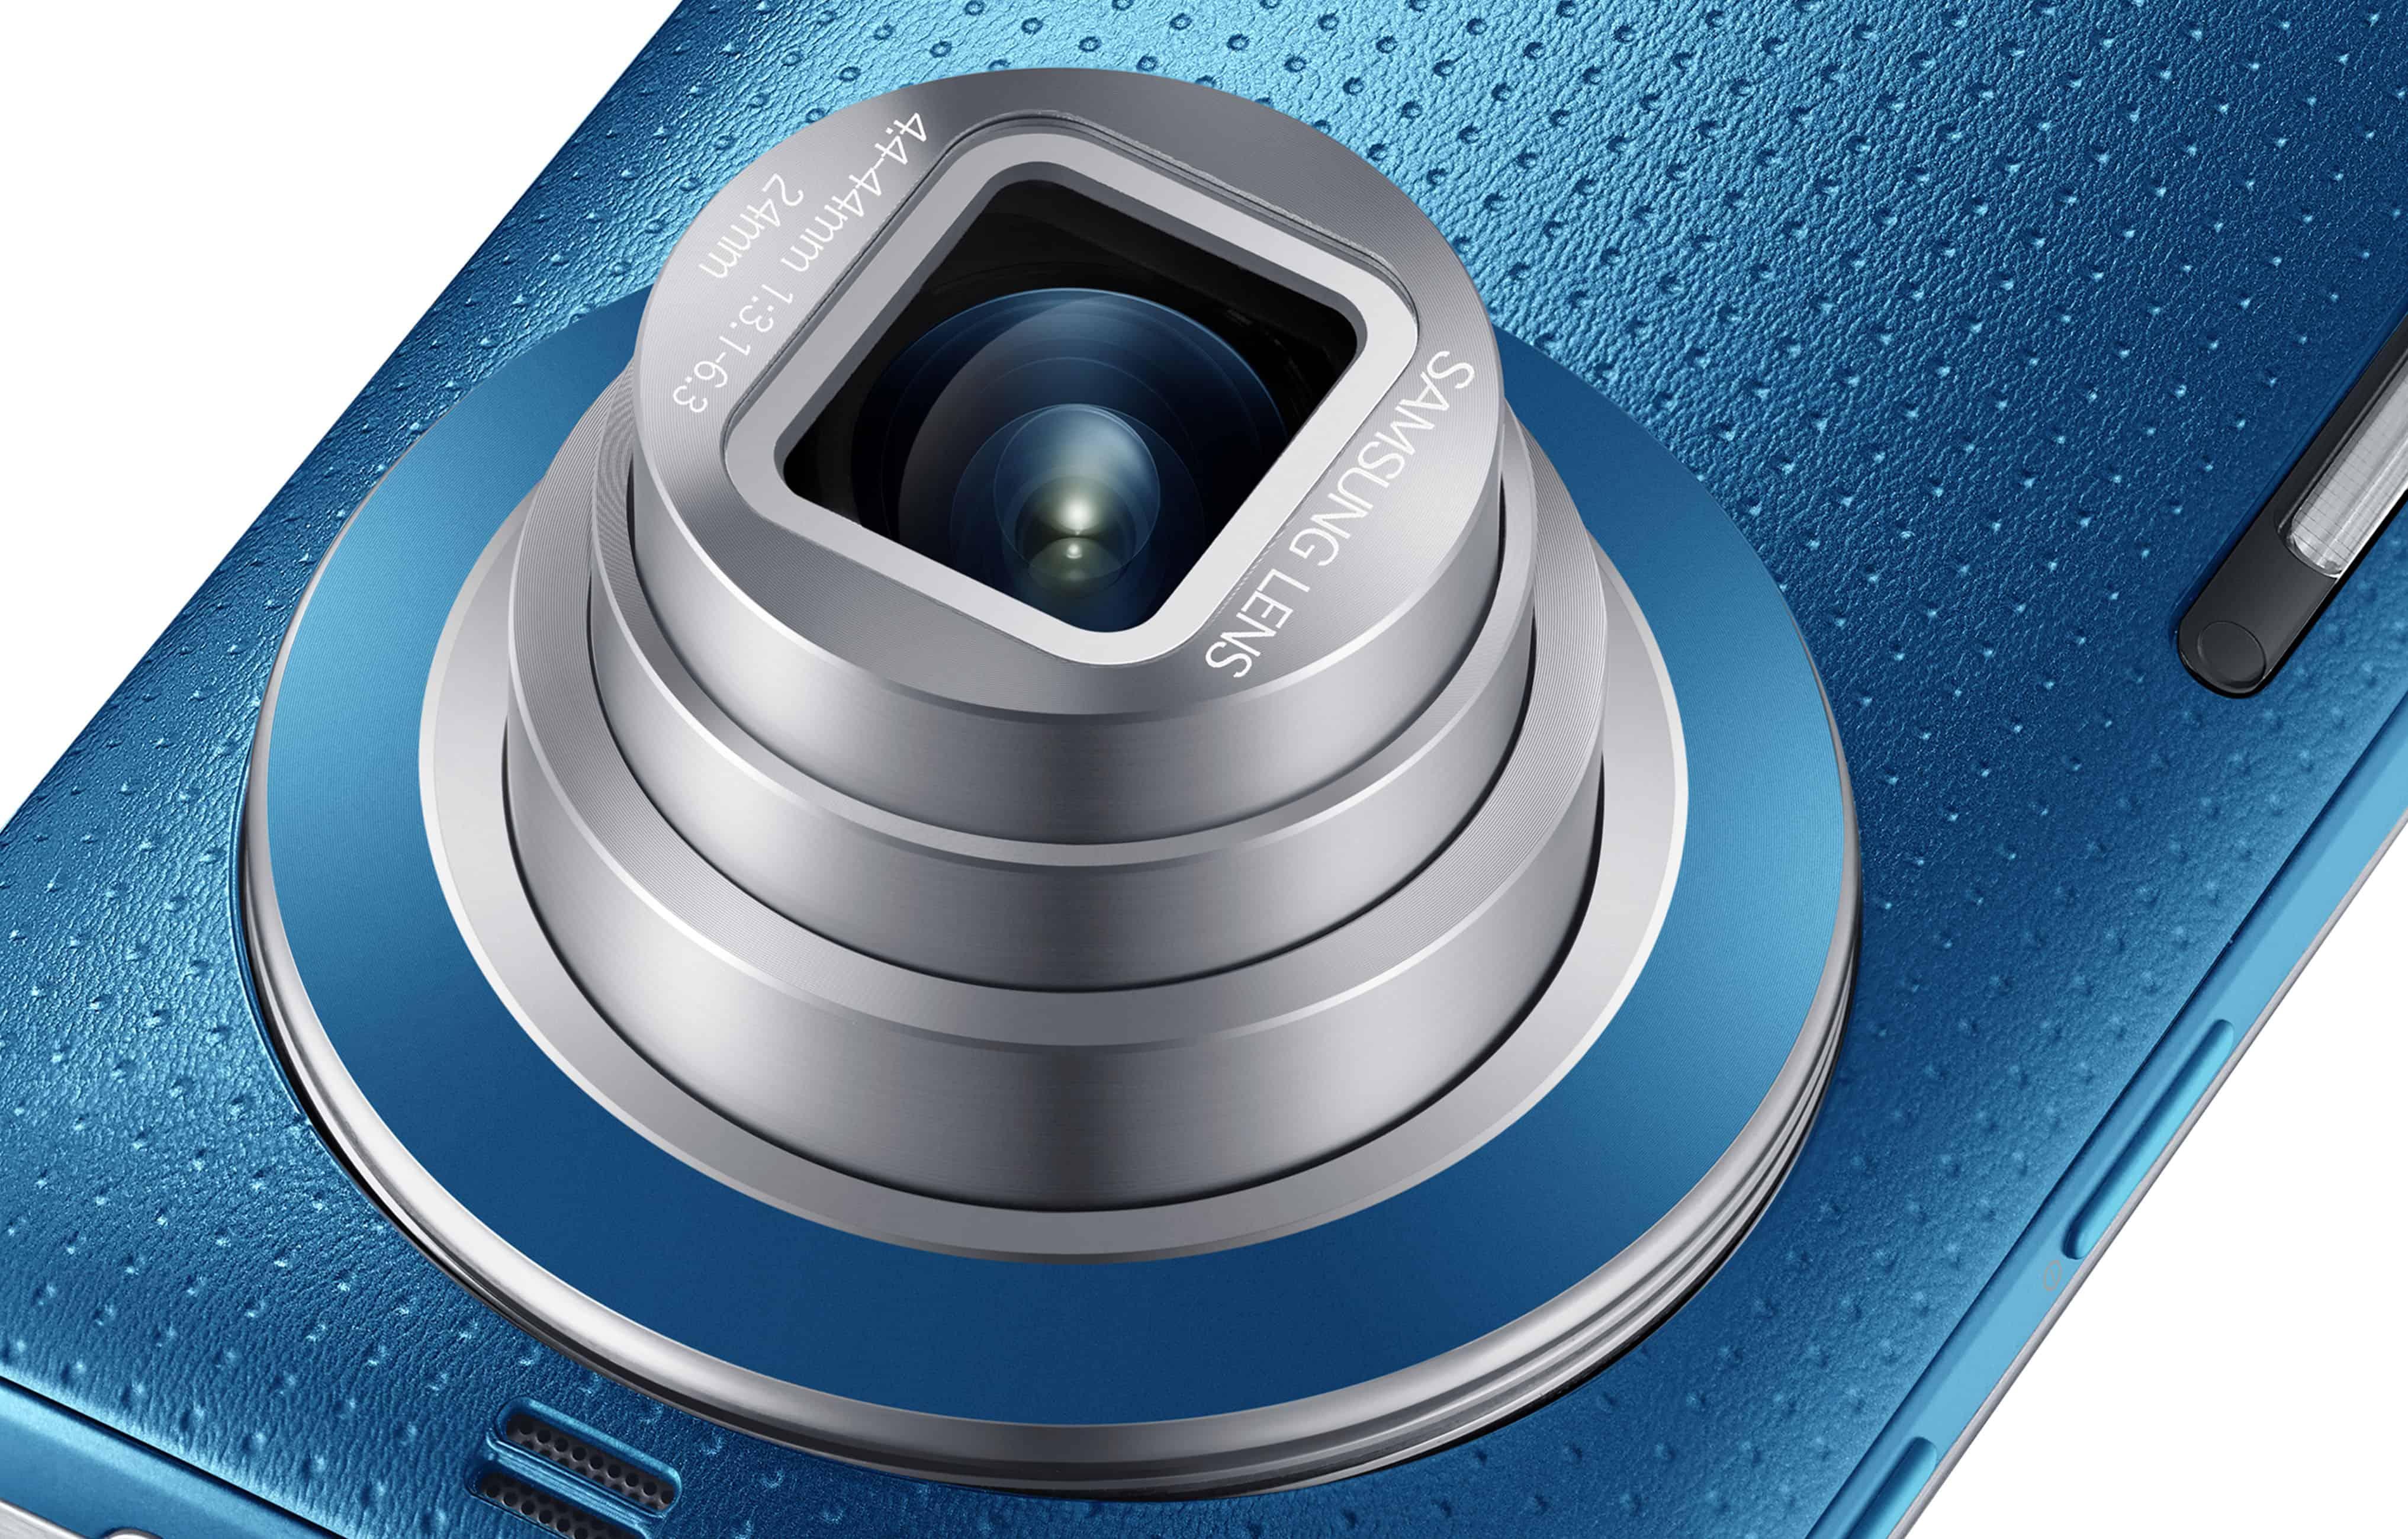 Galaxy K zoom_Electric Blue_10